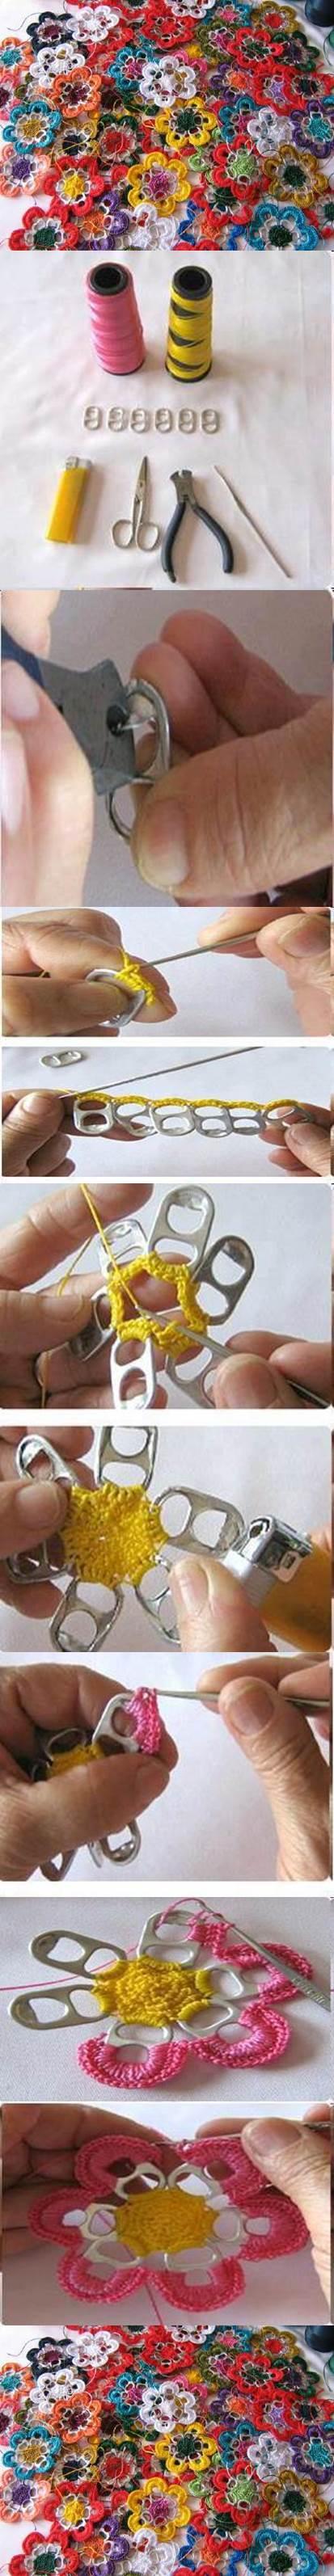 DIY-Pull-Tabs-Crochet-Flowers